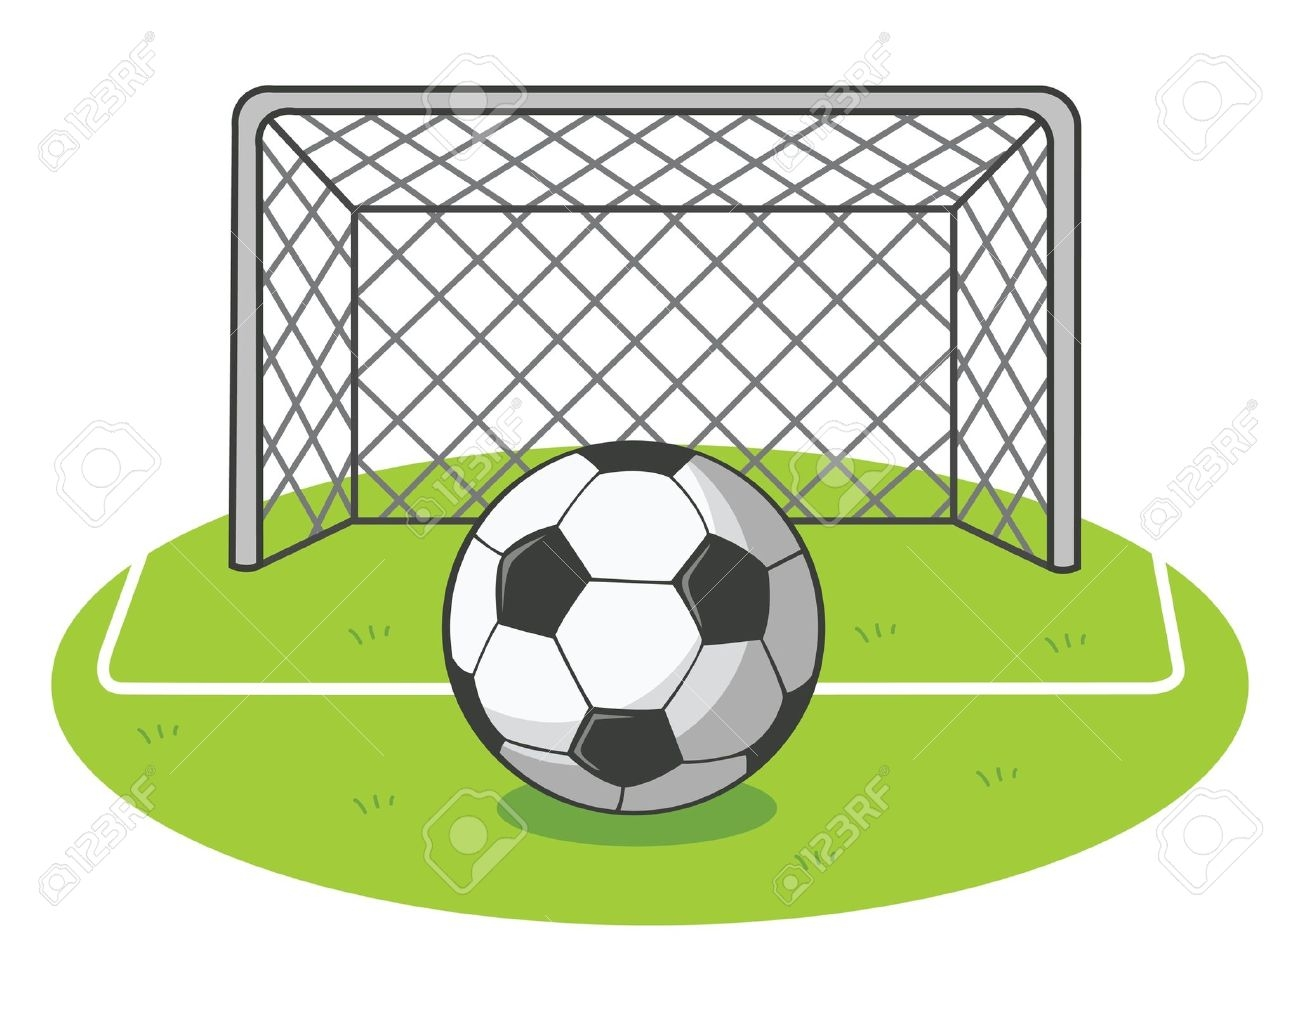 Goal clipart. Luxury soccer wallpaper download